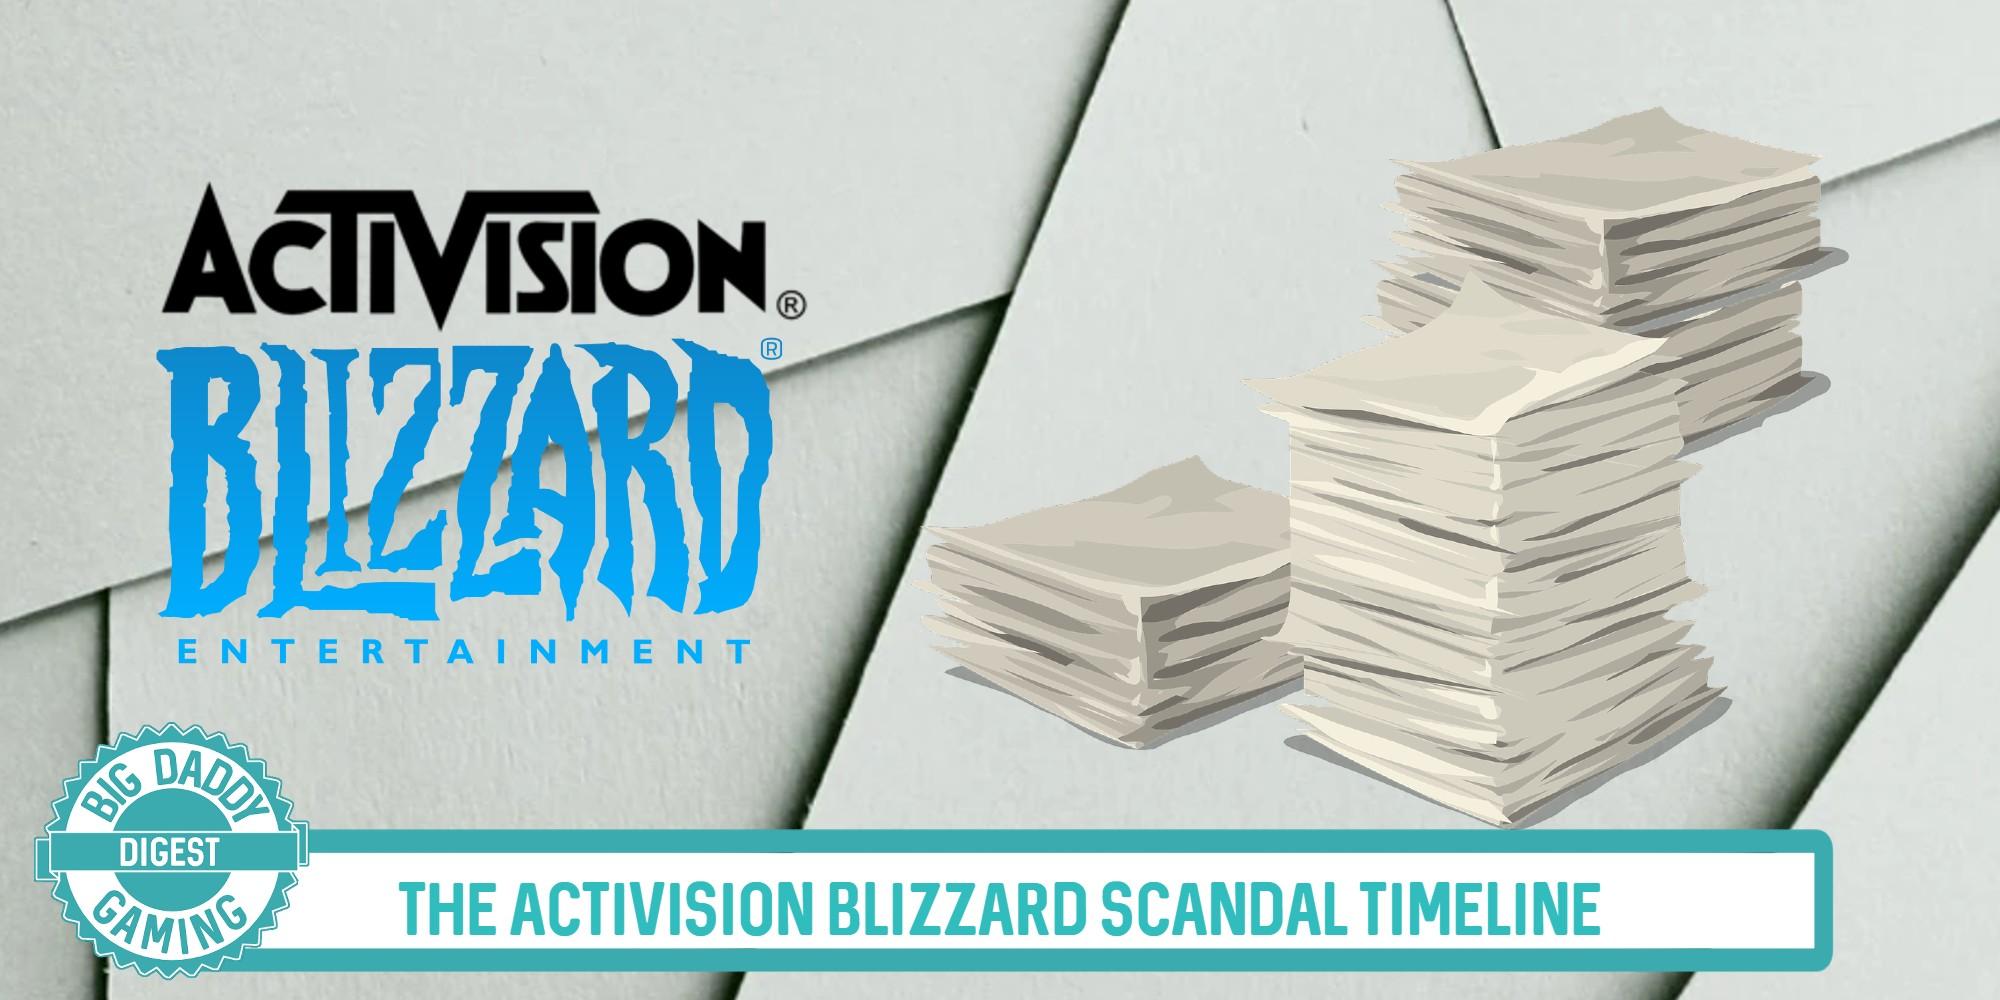 Activision Blizzard Scandal